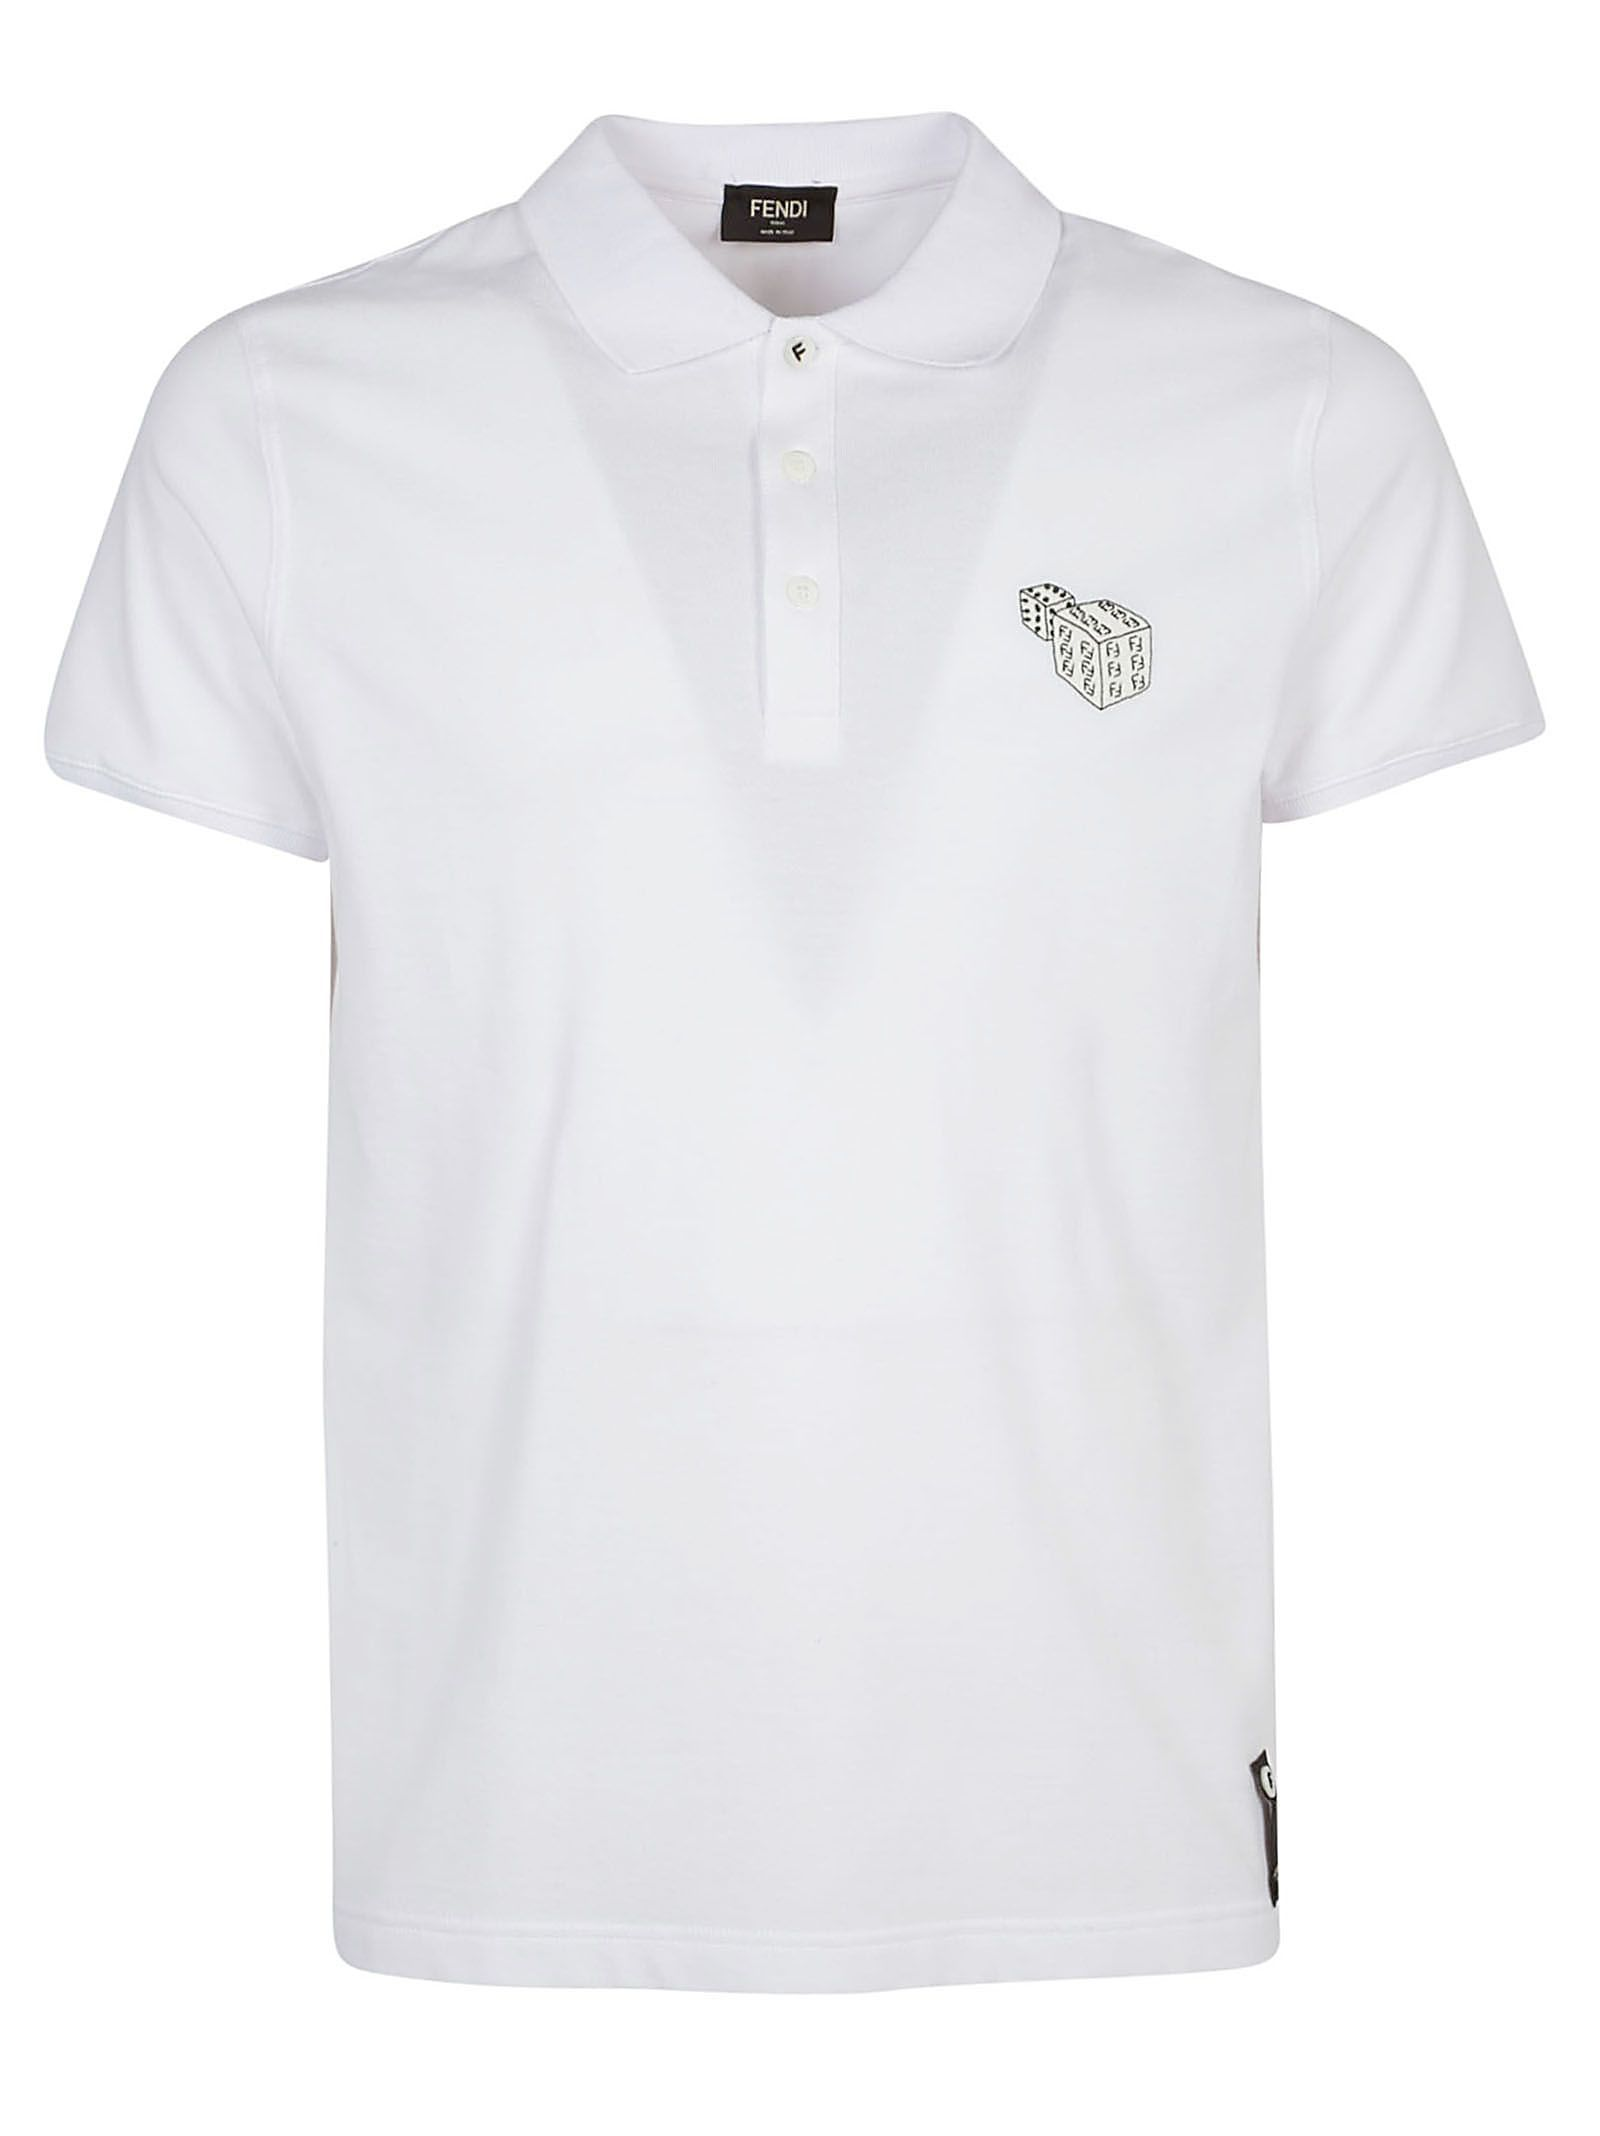 a8649467c1a  fendi  cloth Embroidered Polo Shirts